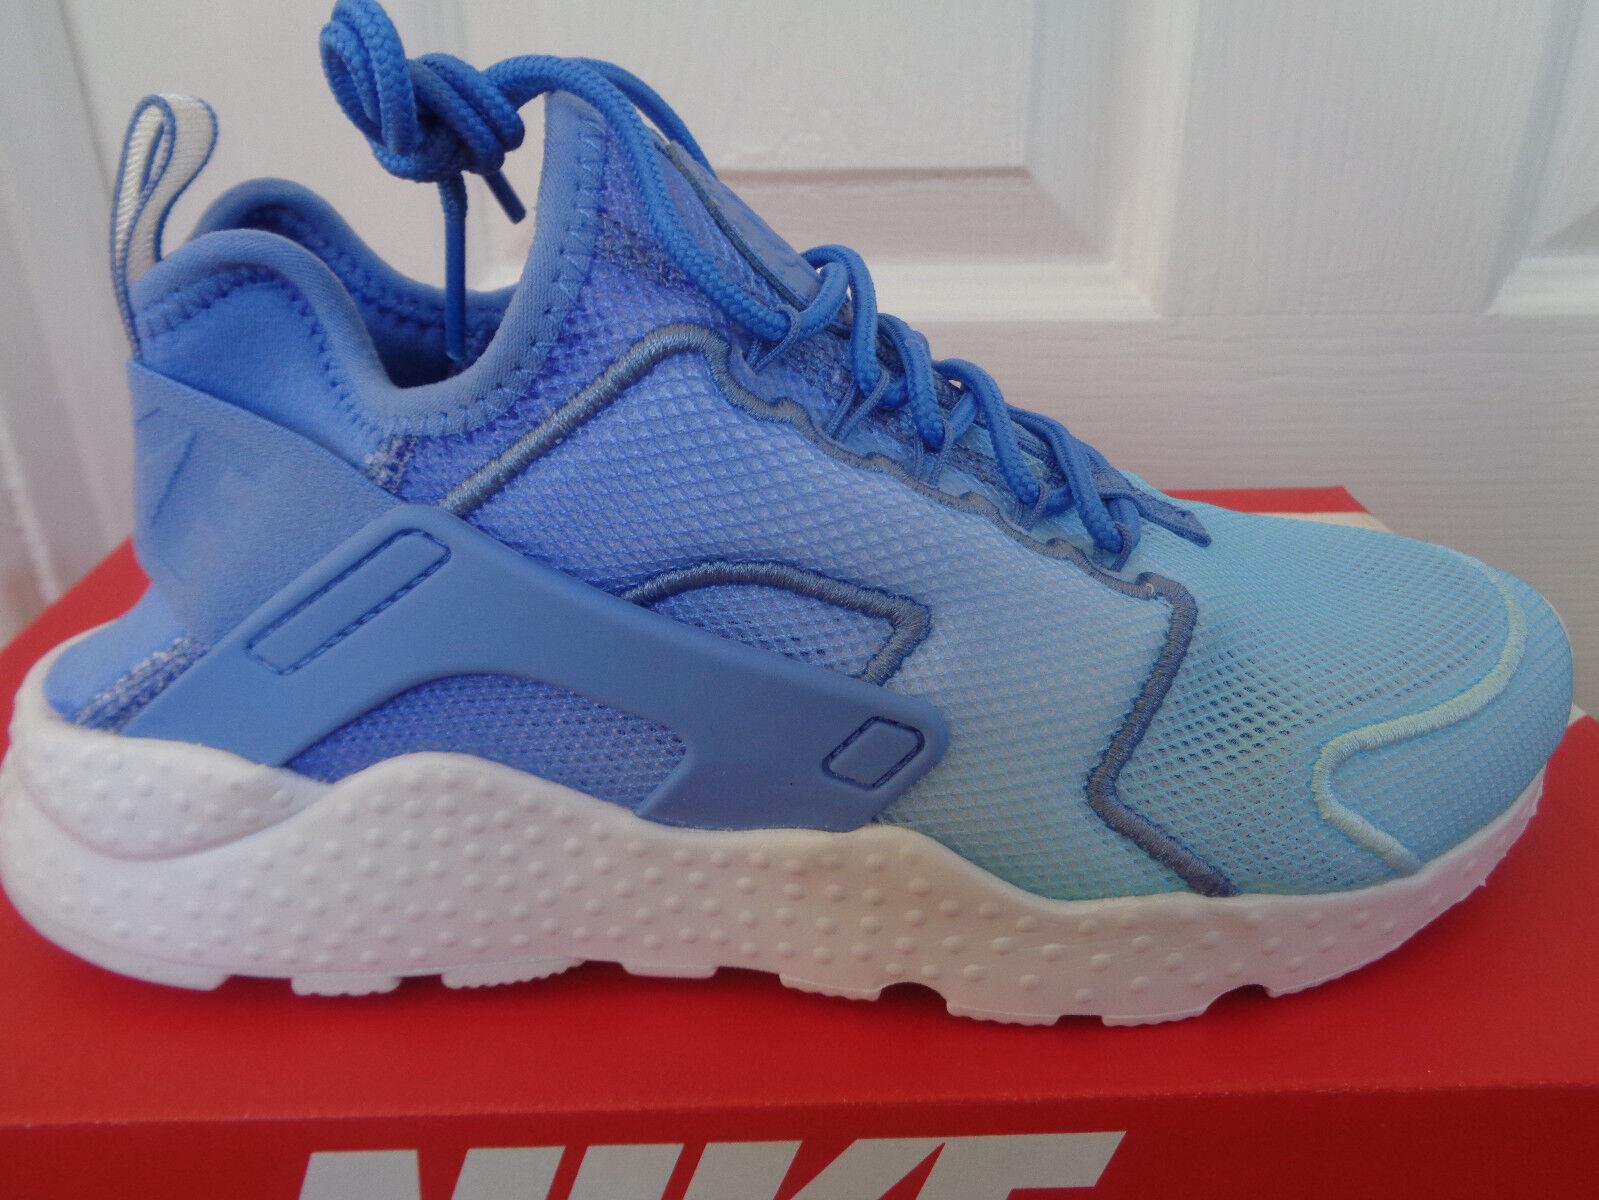 Nike Air Huarache Run Ultra BR trainers 833292 401 uk 5 eu 38.5 us 7.5 NEW+BOX